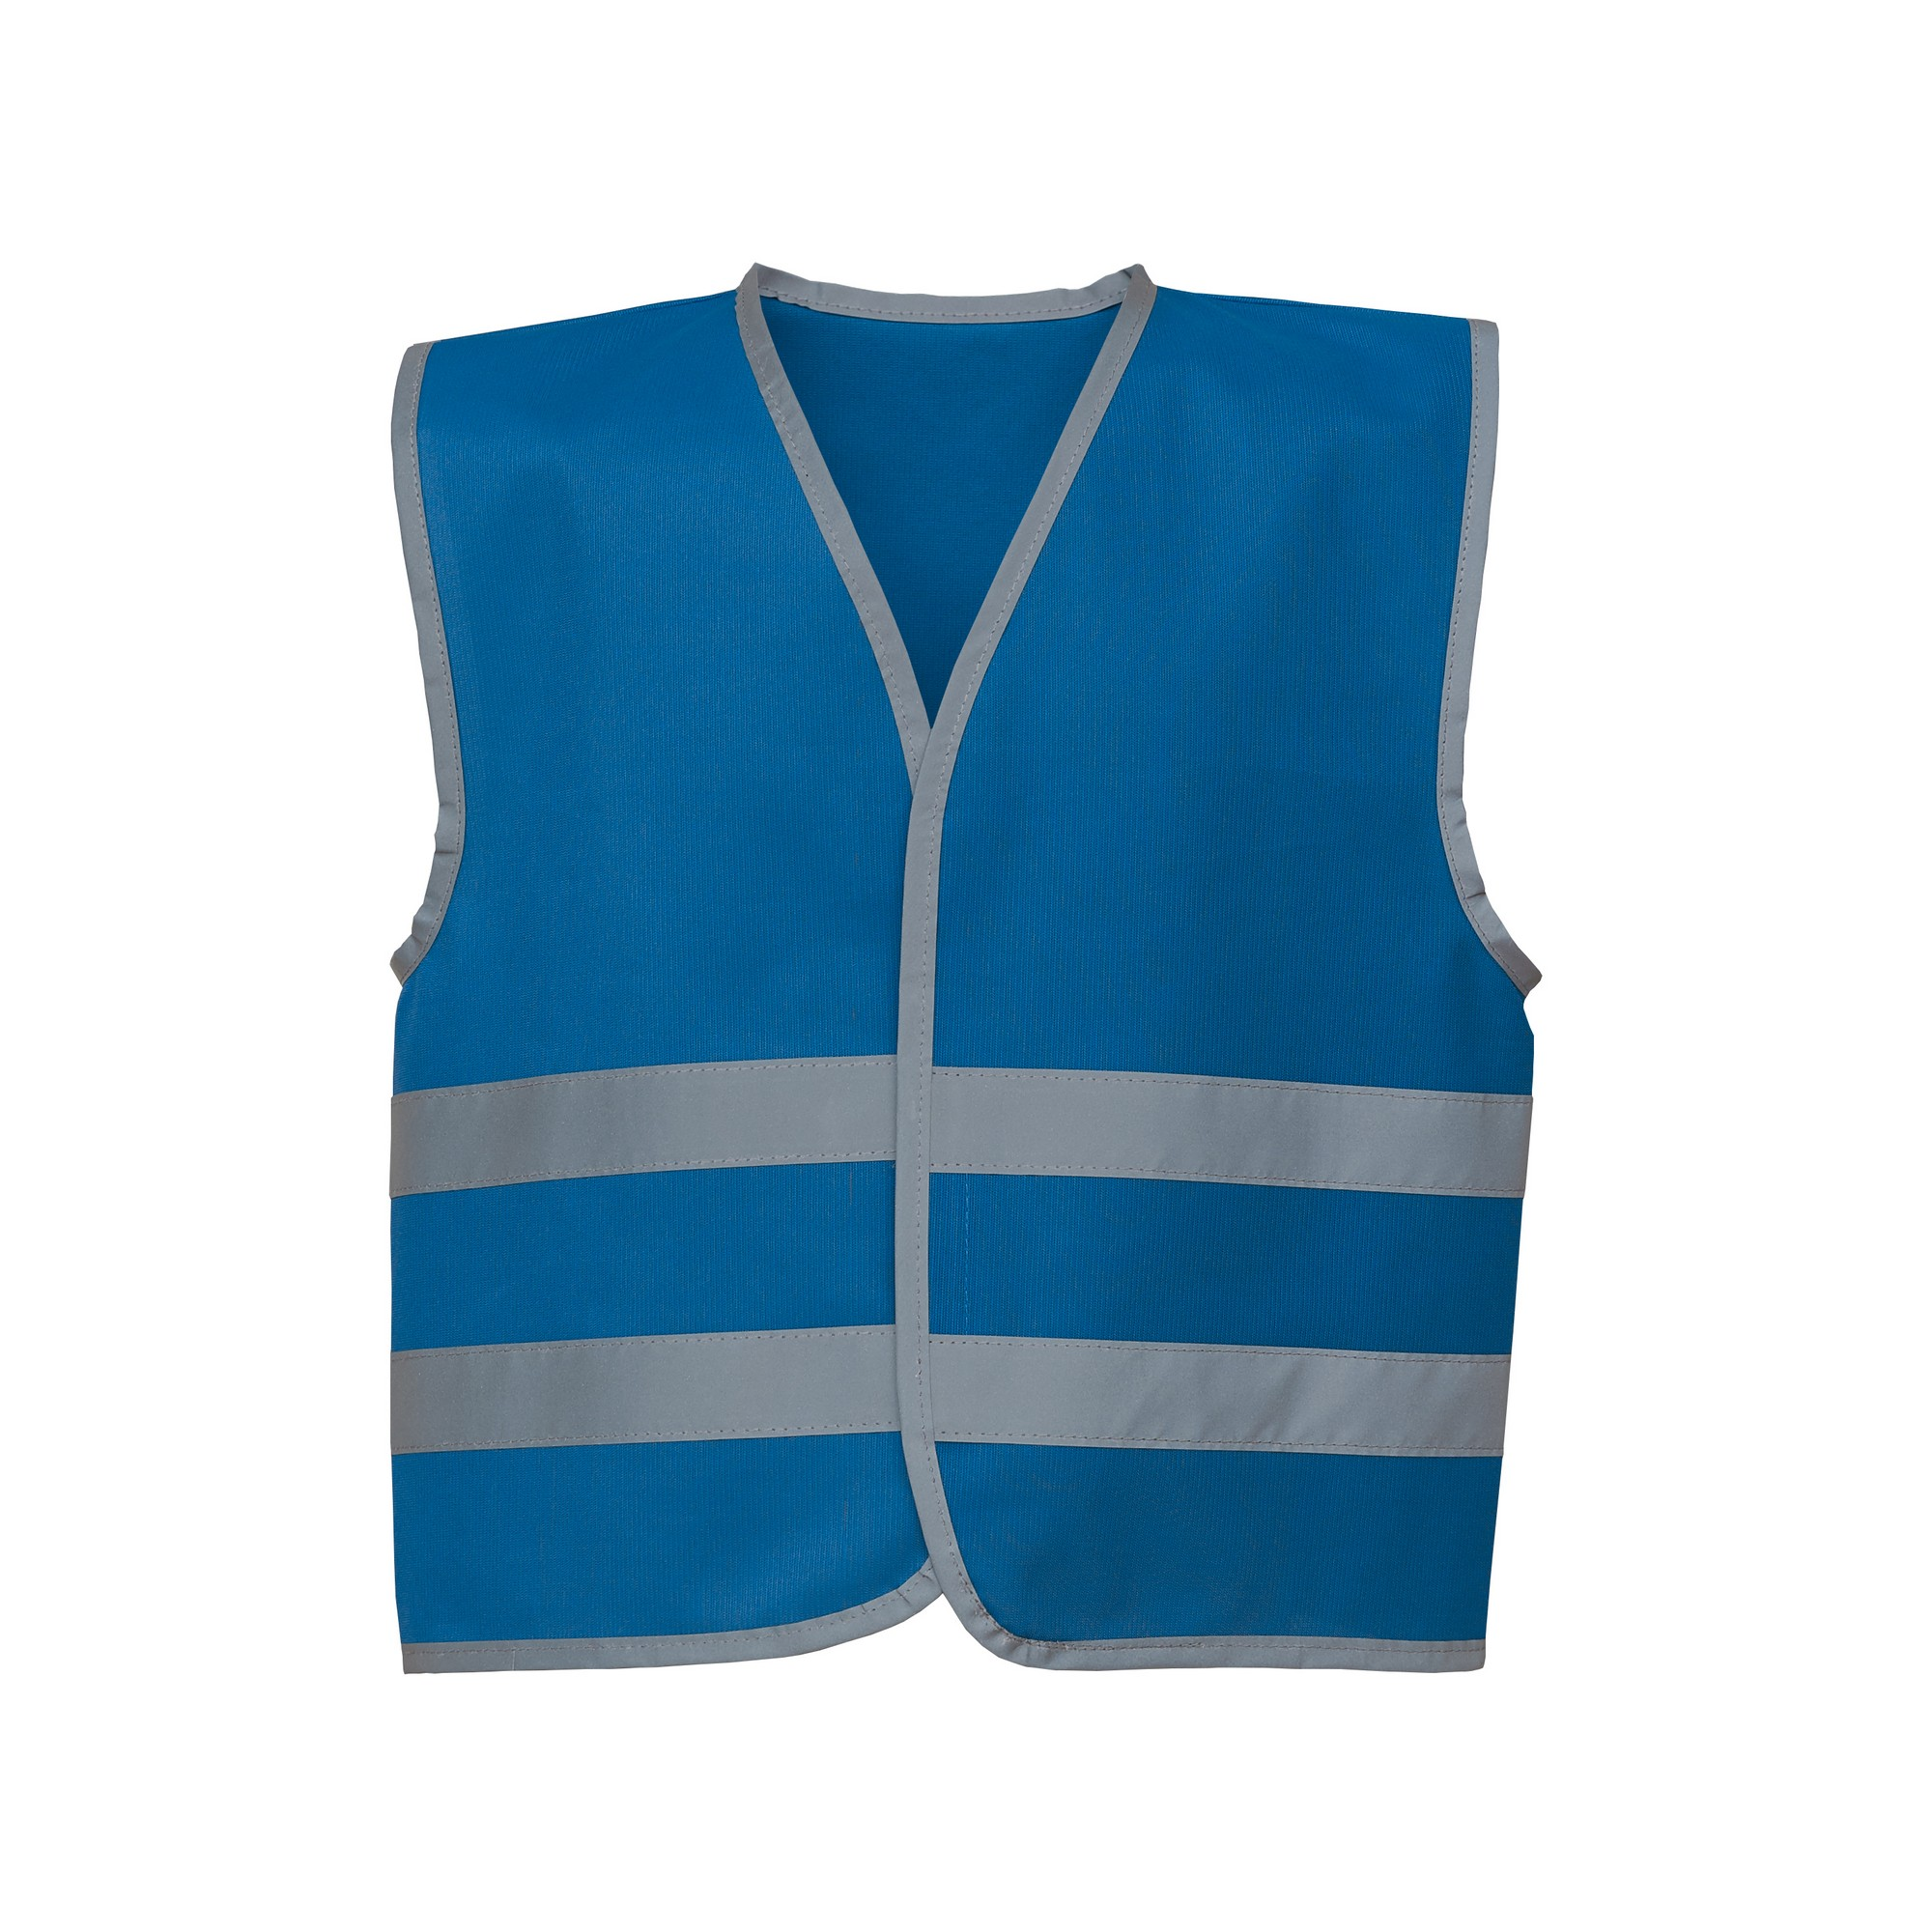 Yoko Hi-Vis Childrens/Kids Reflective Border Waistcoat (M) (Royal Blue)